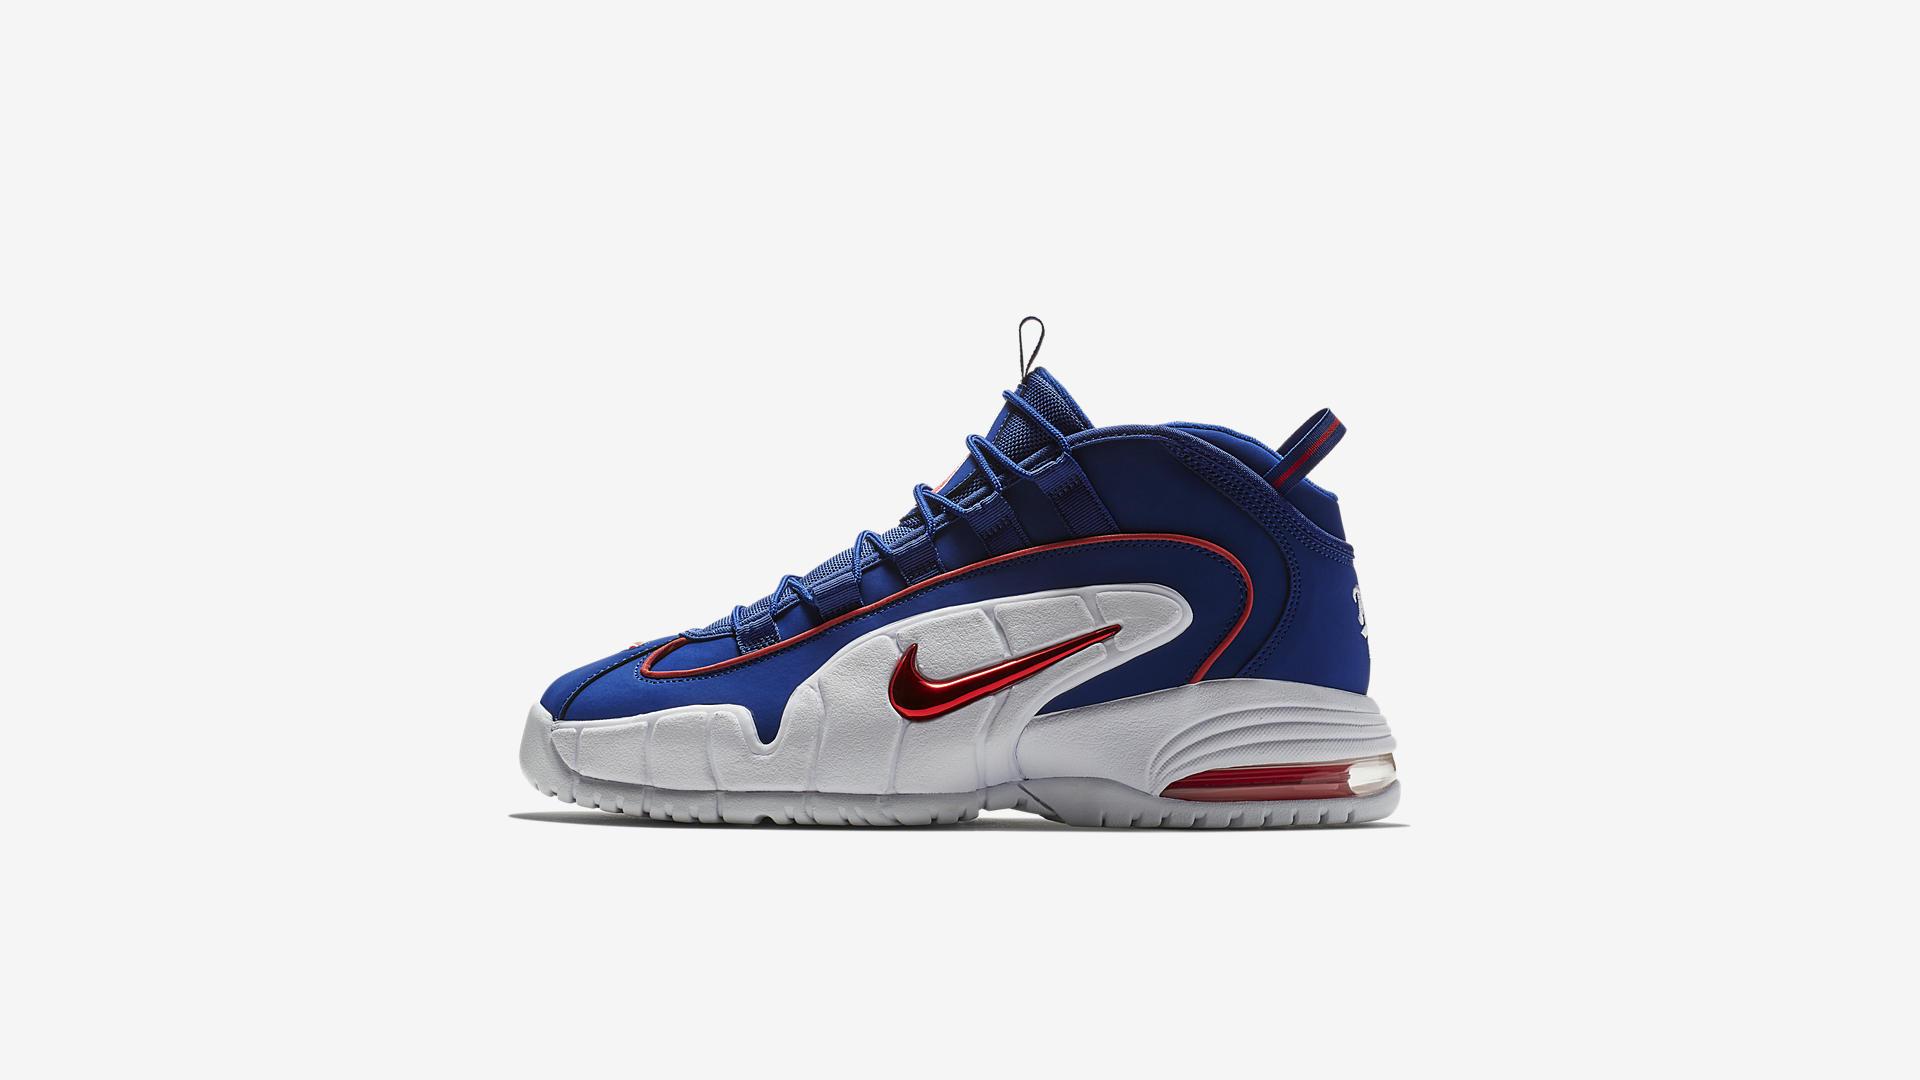 Nike Air Max Penny Deep Royal Blue / Gym Red-White (685153-400)